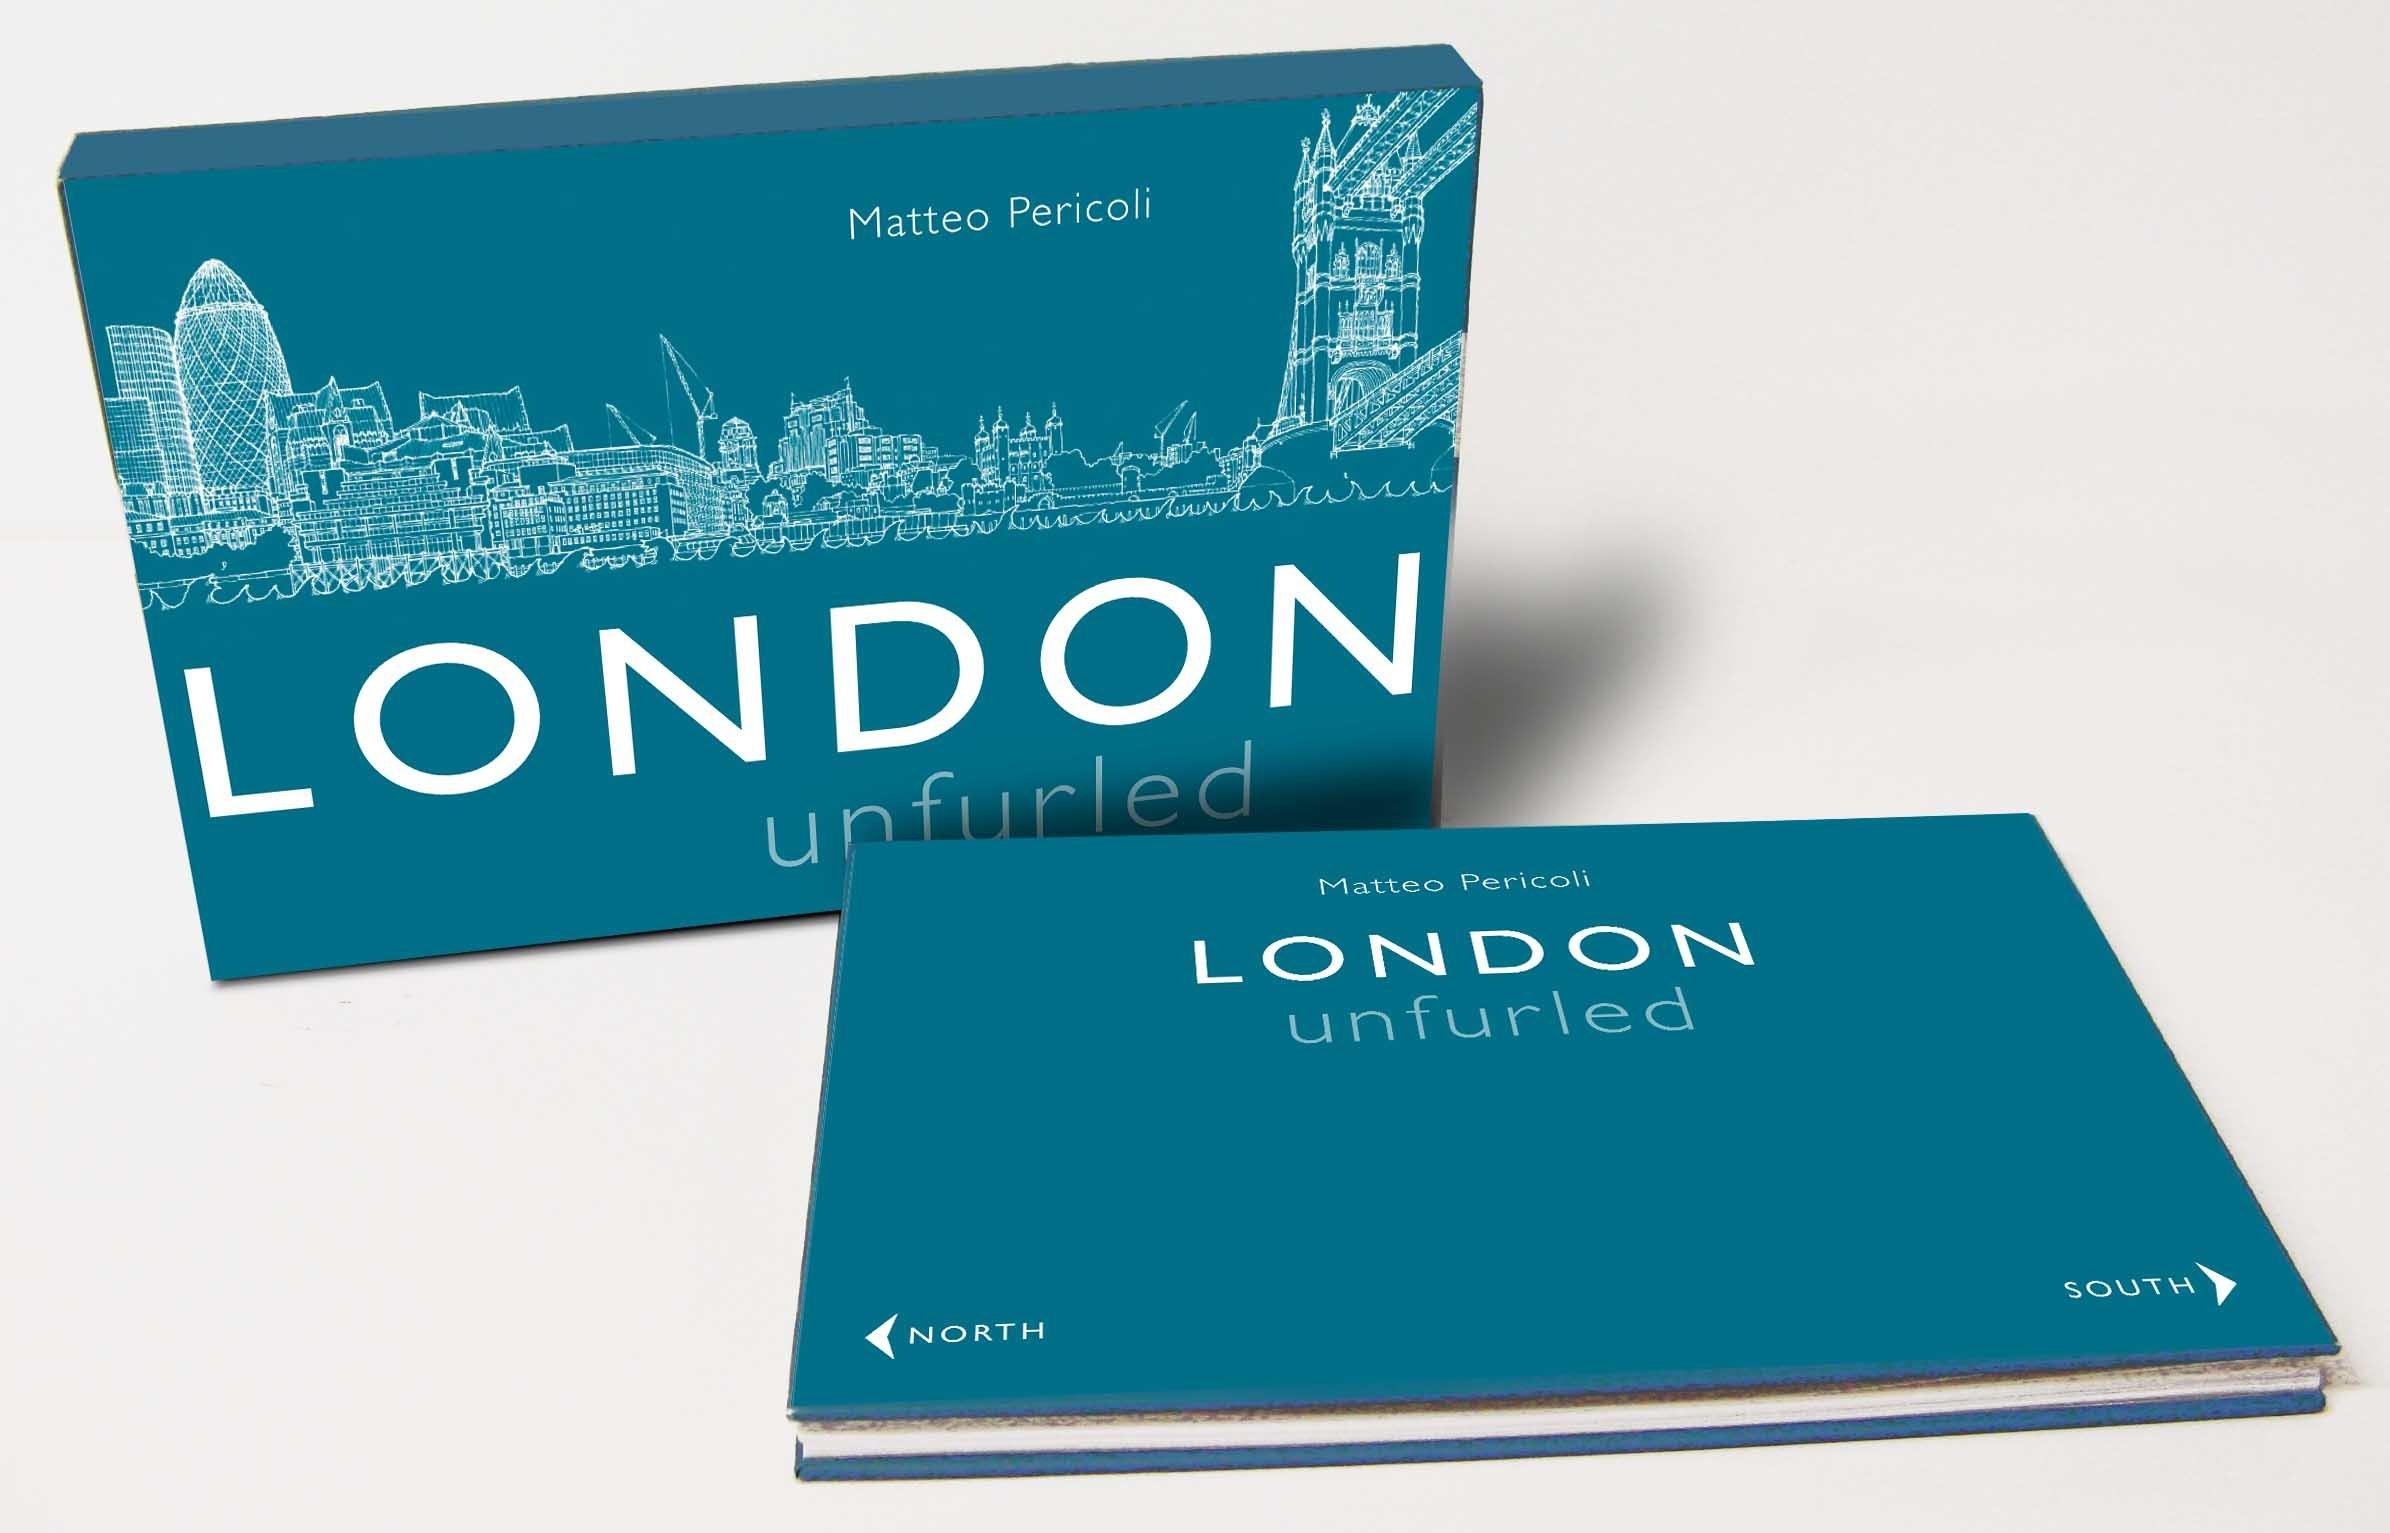 London Unfurled: Matteo Pericoli: 9780330517829: Amazon.com: Books